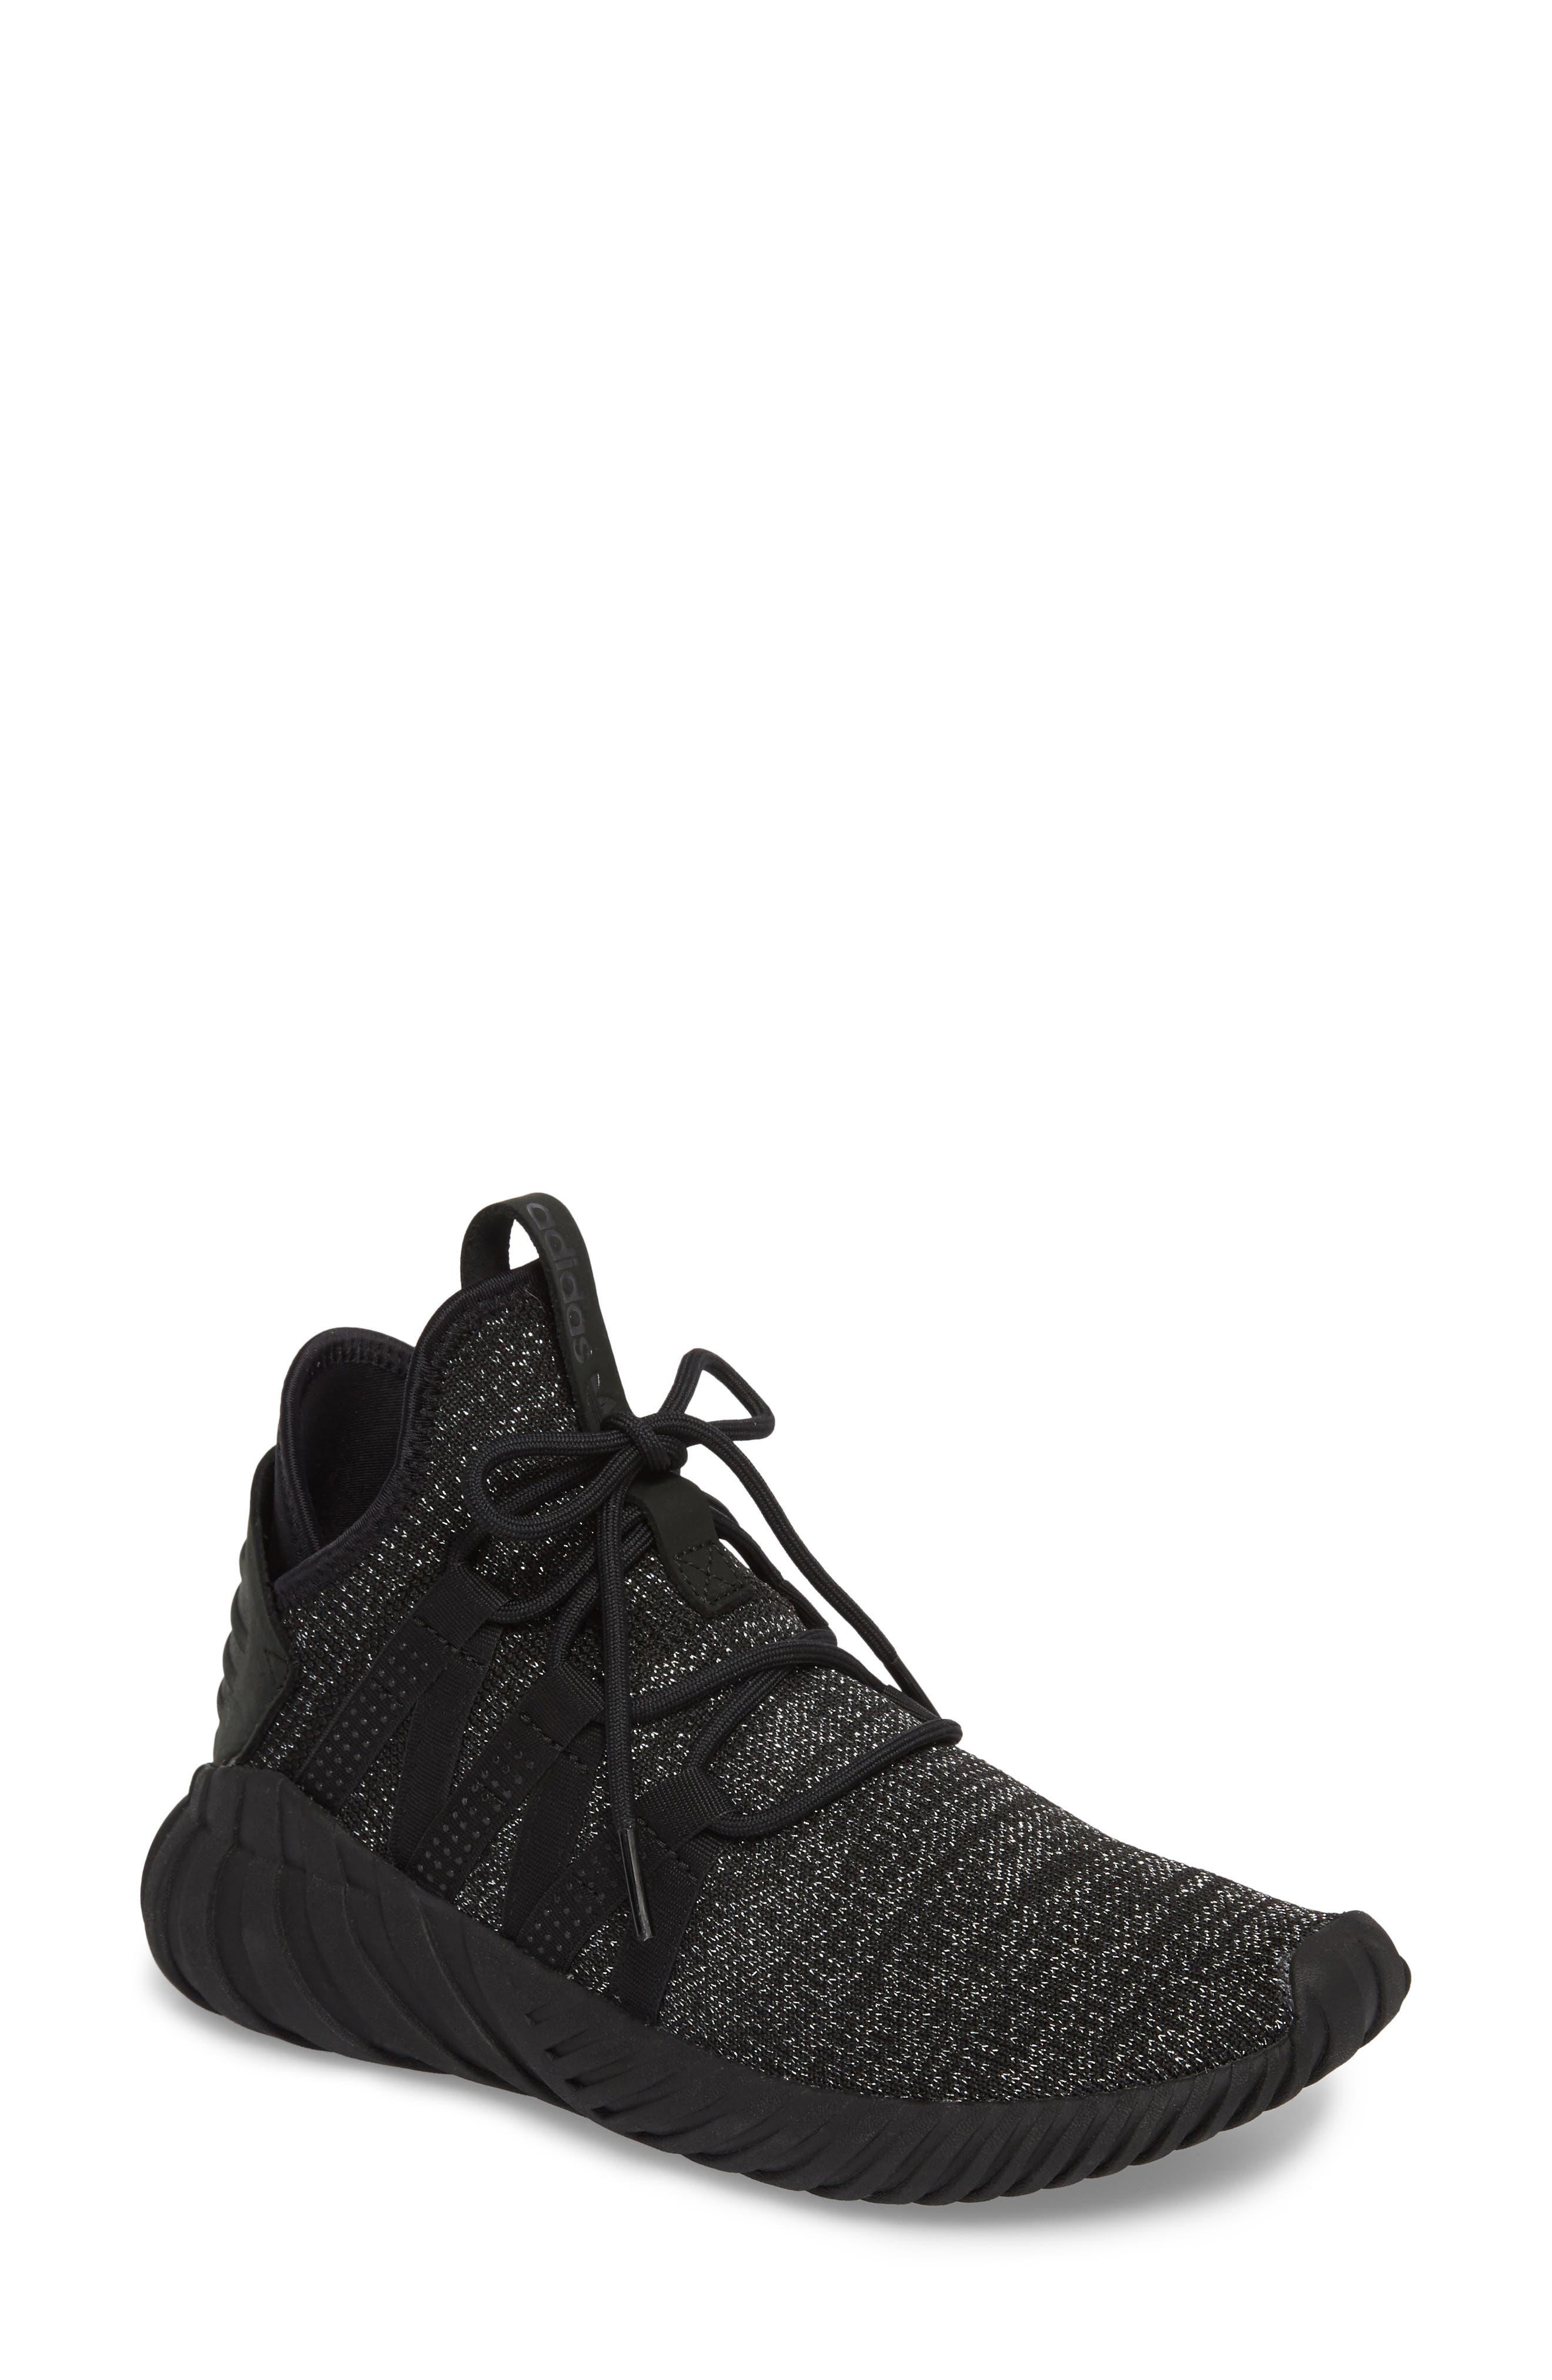 Alternate Image 1 Selected - adidas Tubular Dawn Primeknit Sneaker (Women)